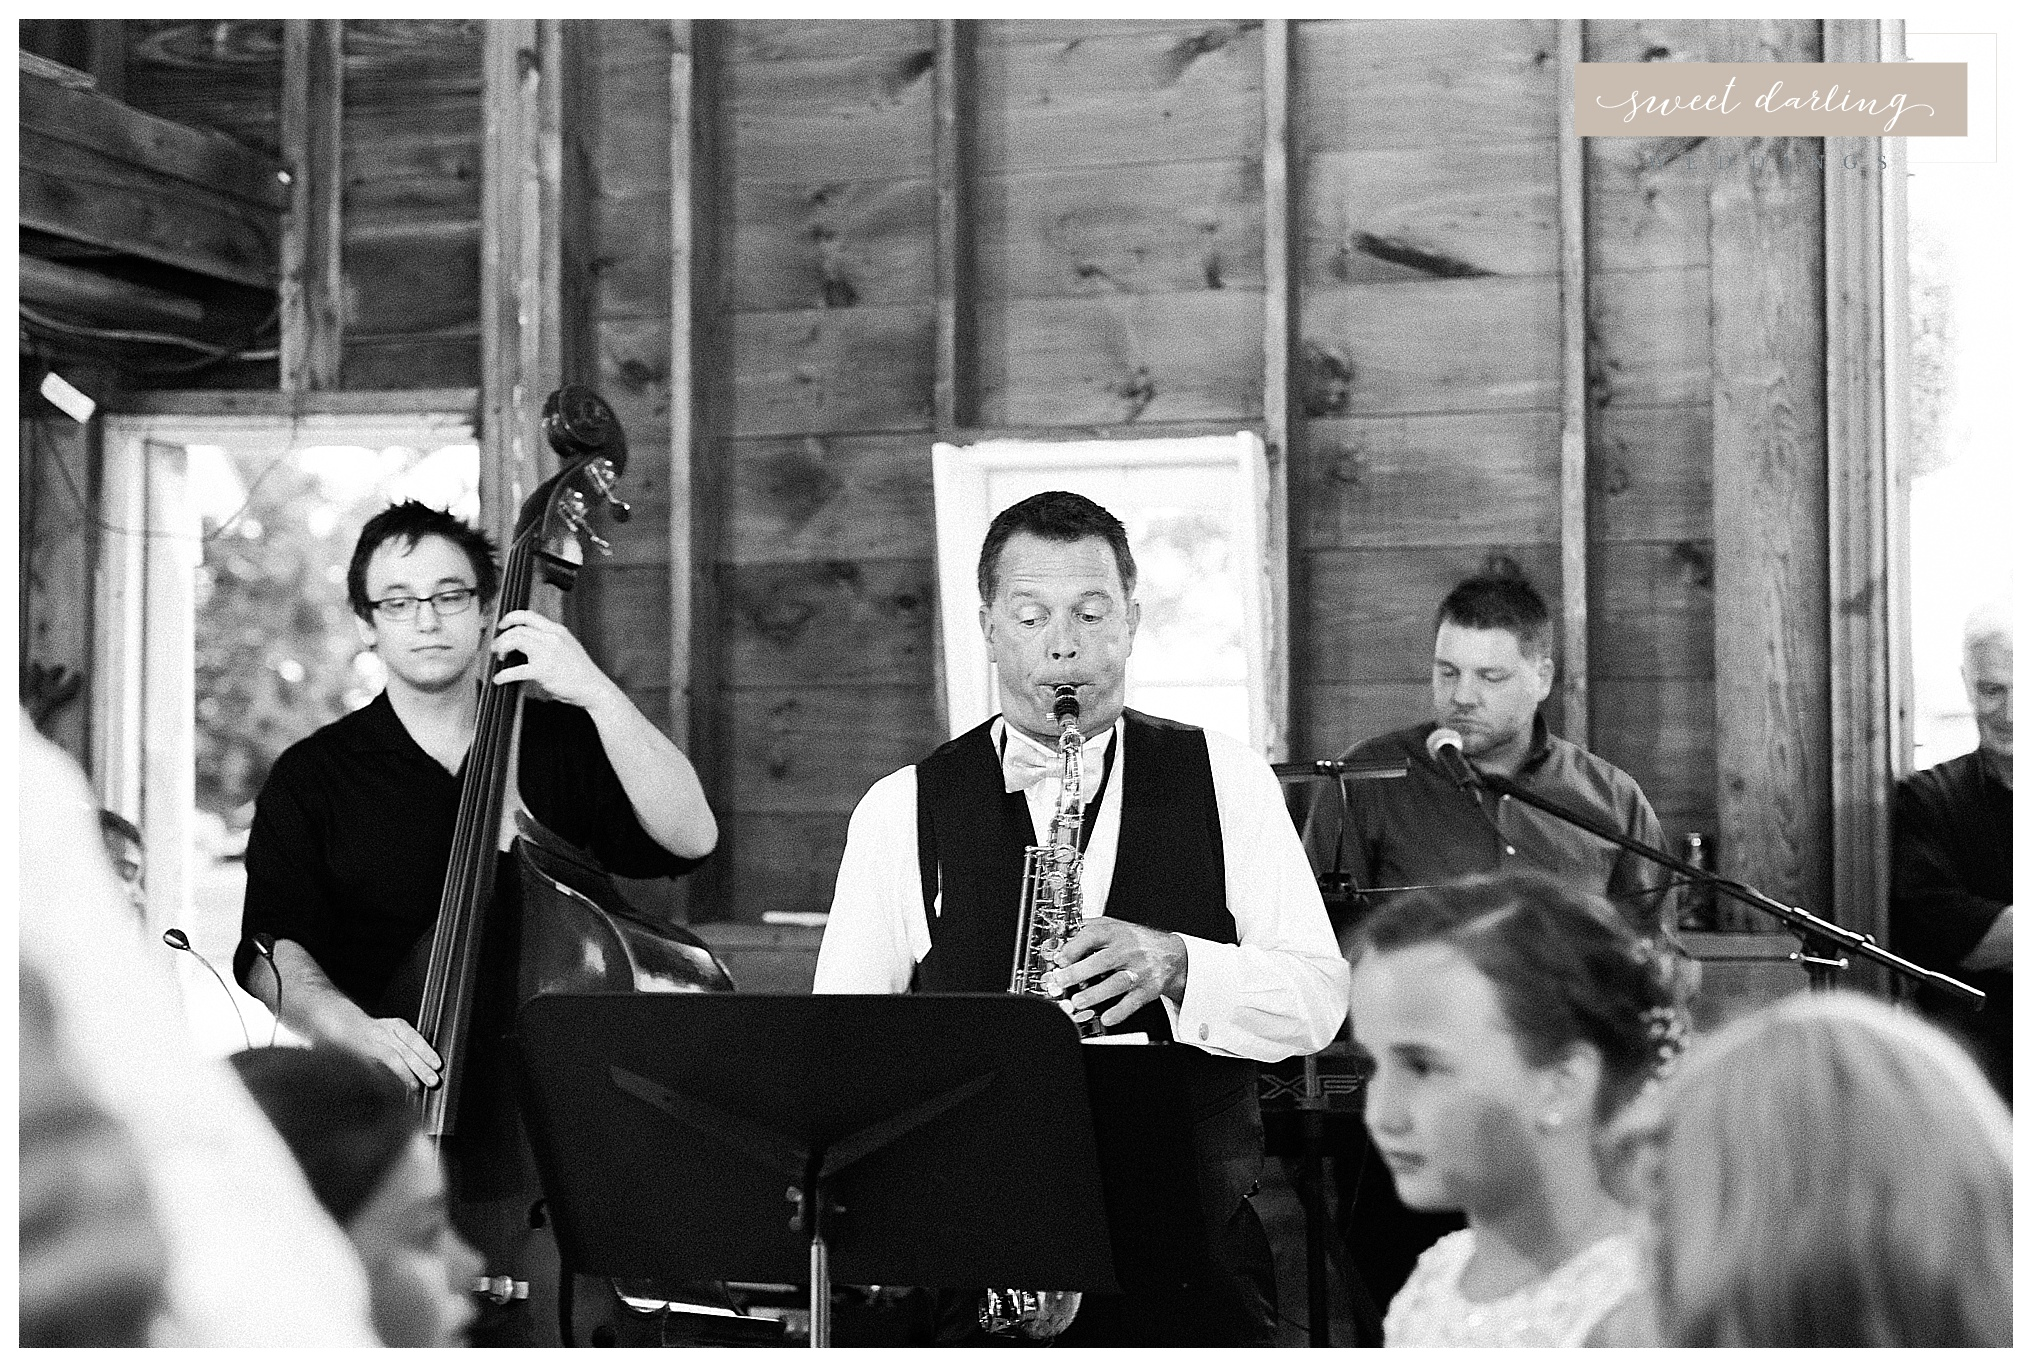 Rpaxton-illinois-engelbrecht-farm-country-wedding-photographer-sweet-darling-weddings_1269.jpg